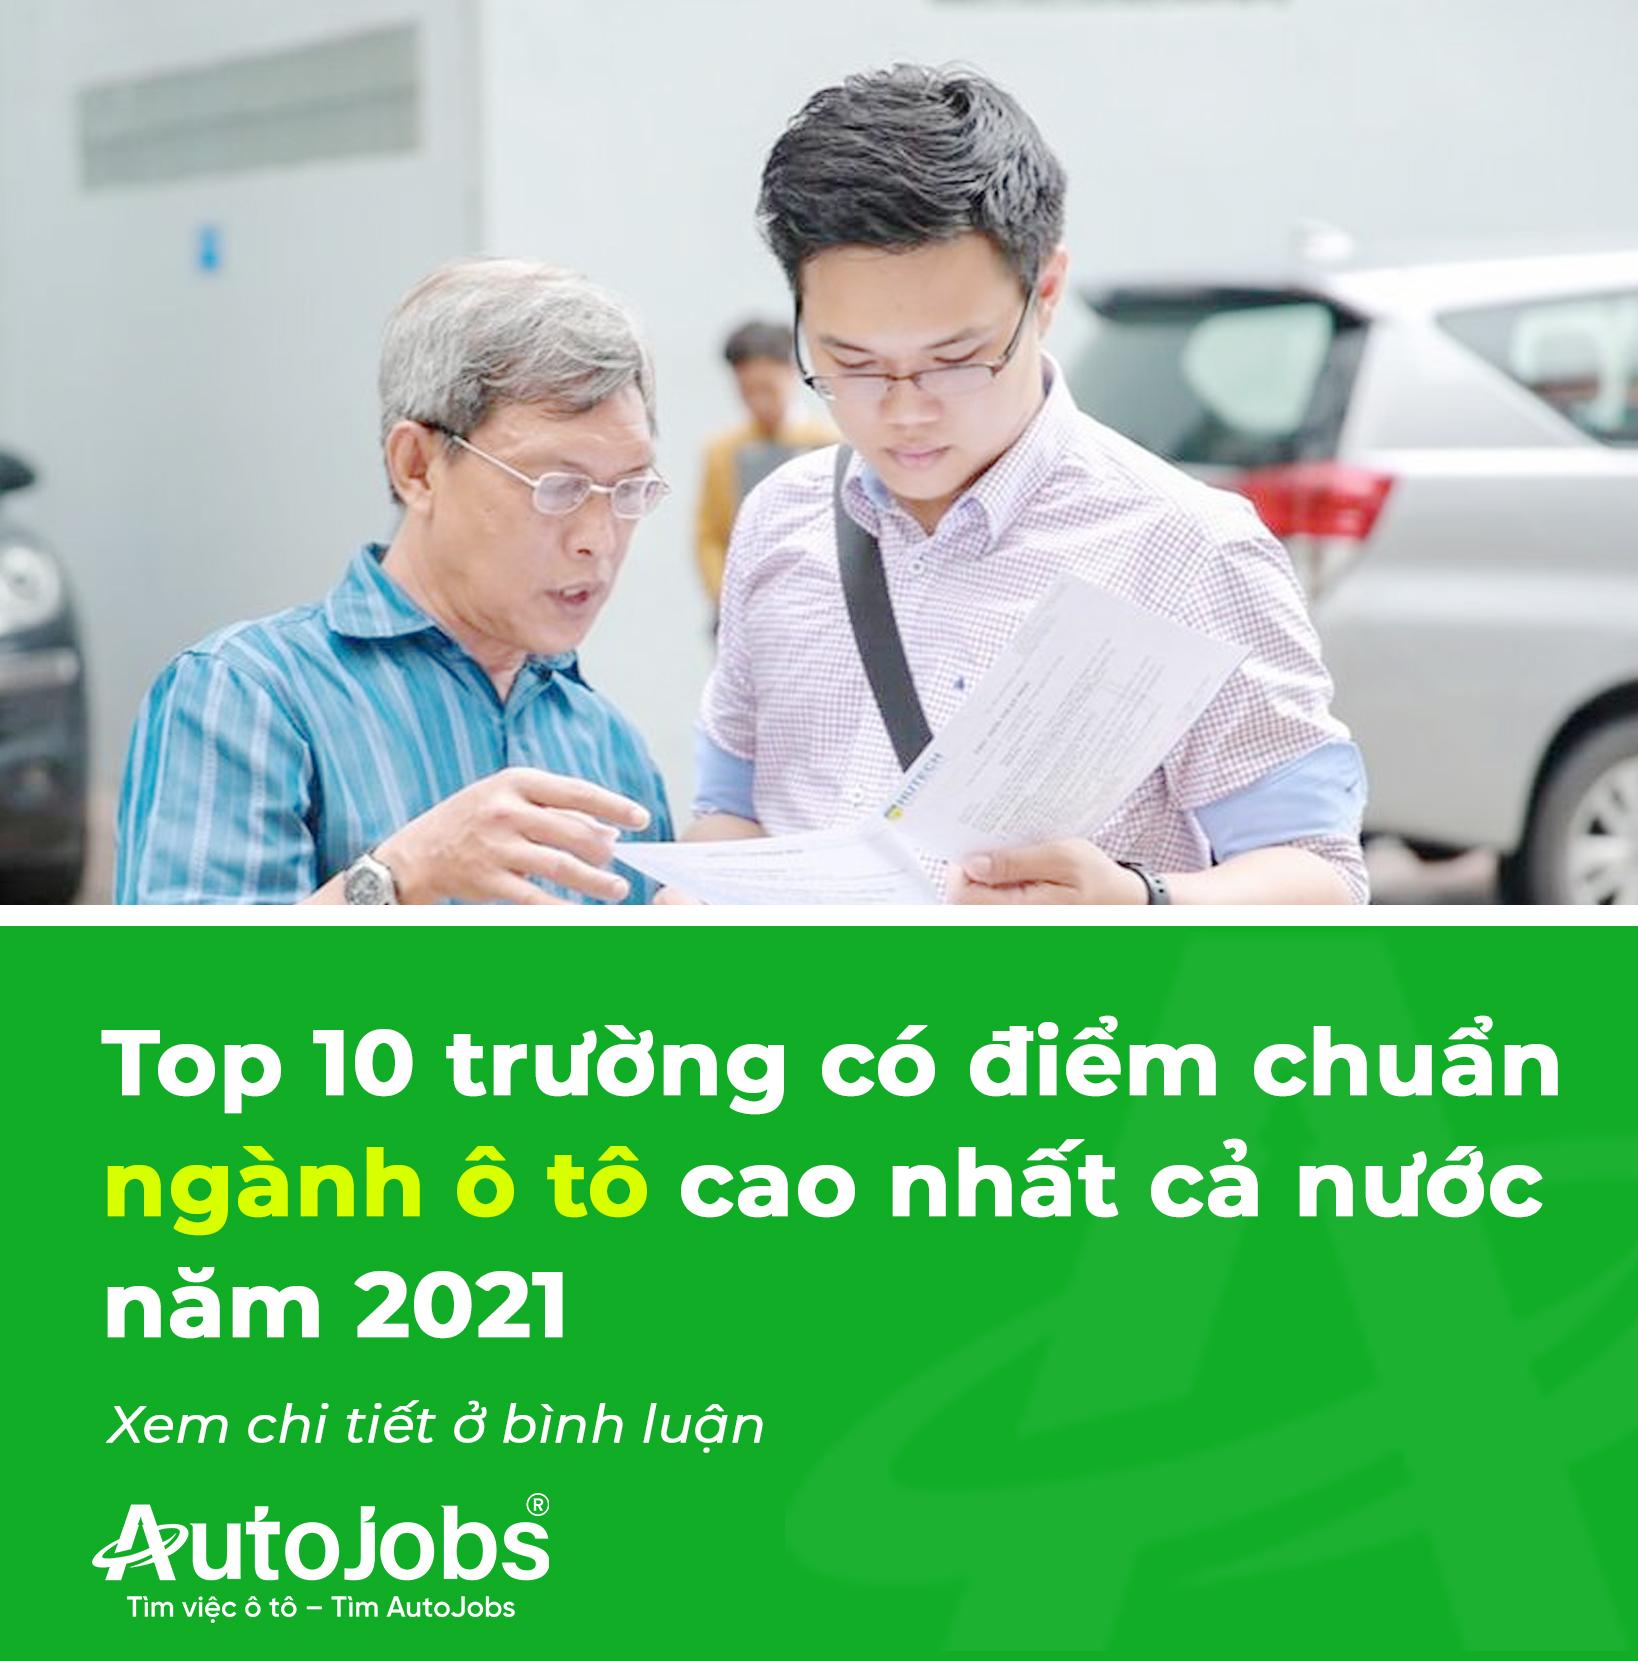 top diem chuan nganh o to nam 2021.jpg